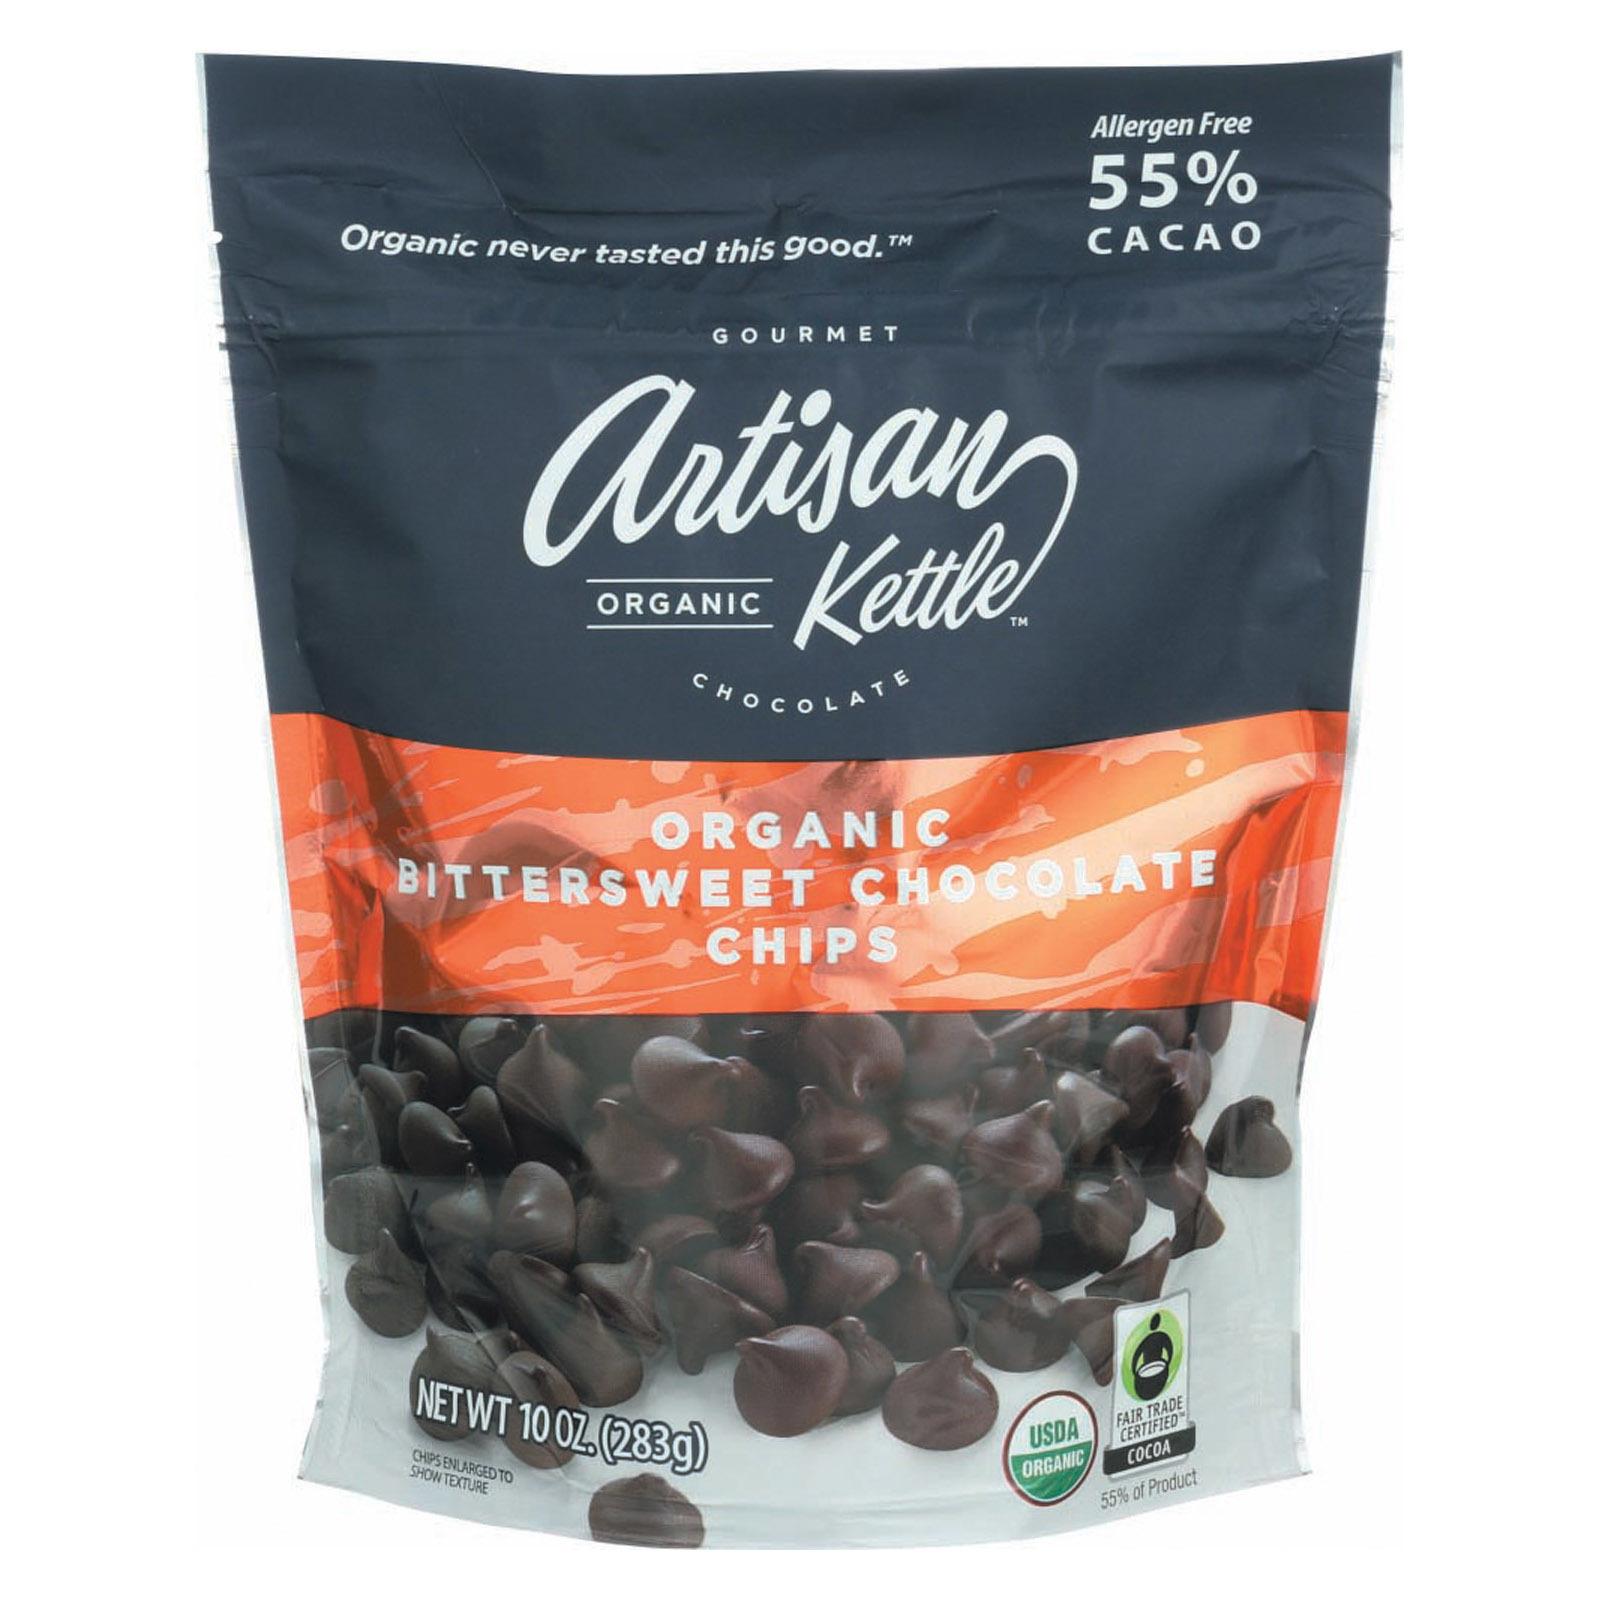 Artisan Kettle Chocolate Chips - Organic - Bittersweet - Case of 6 - 10 oz